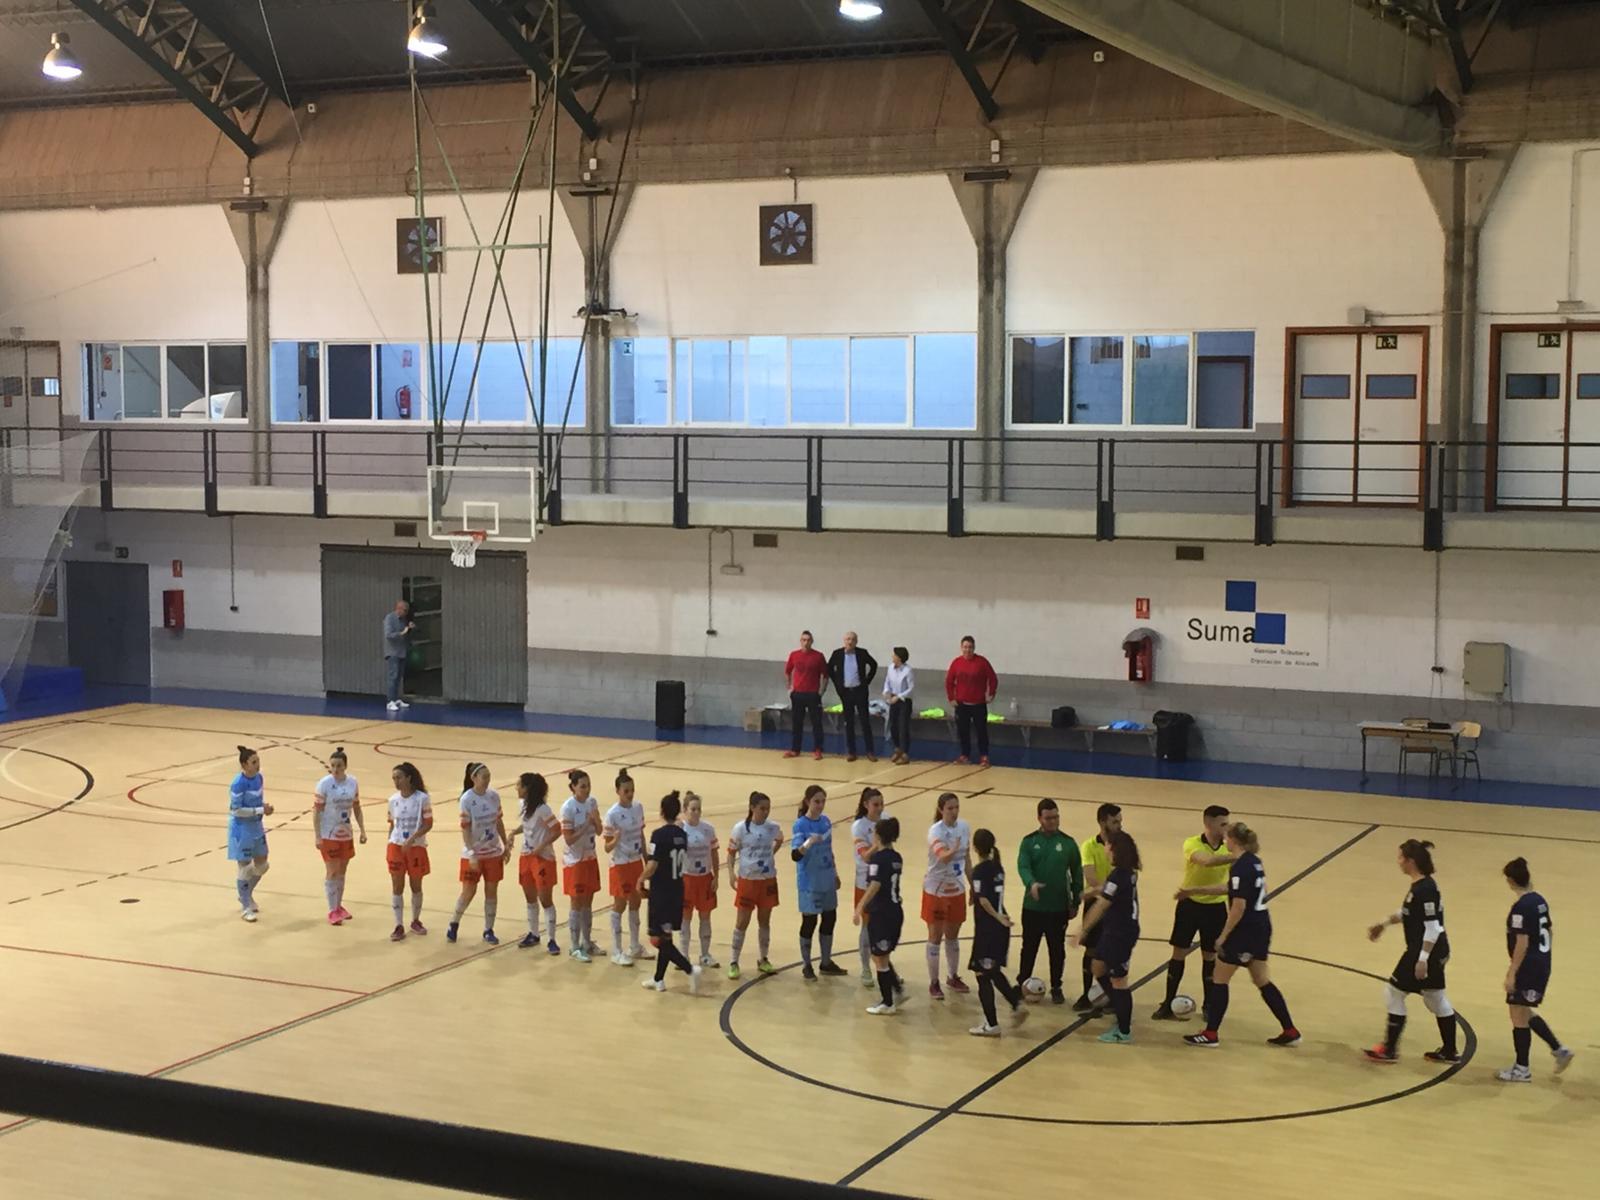 Crónica: Universidad de Alicante FSF - Bilbo Fútbol Sala Femenino. Jornada 19ª. 1ª División Fútbol Sala Femenino